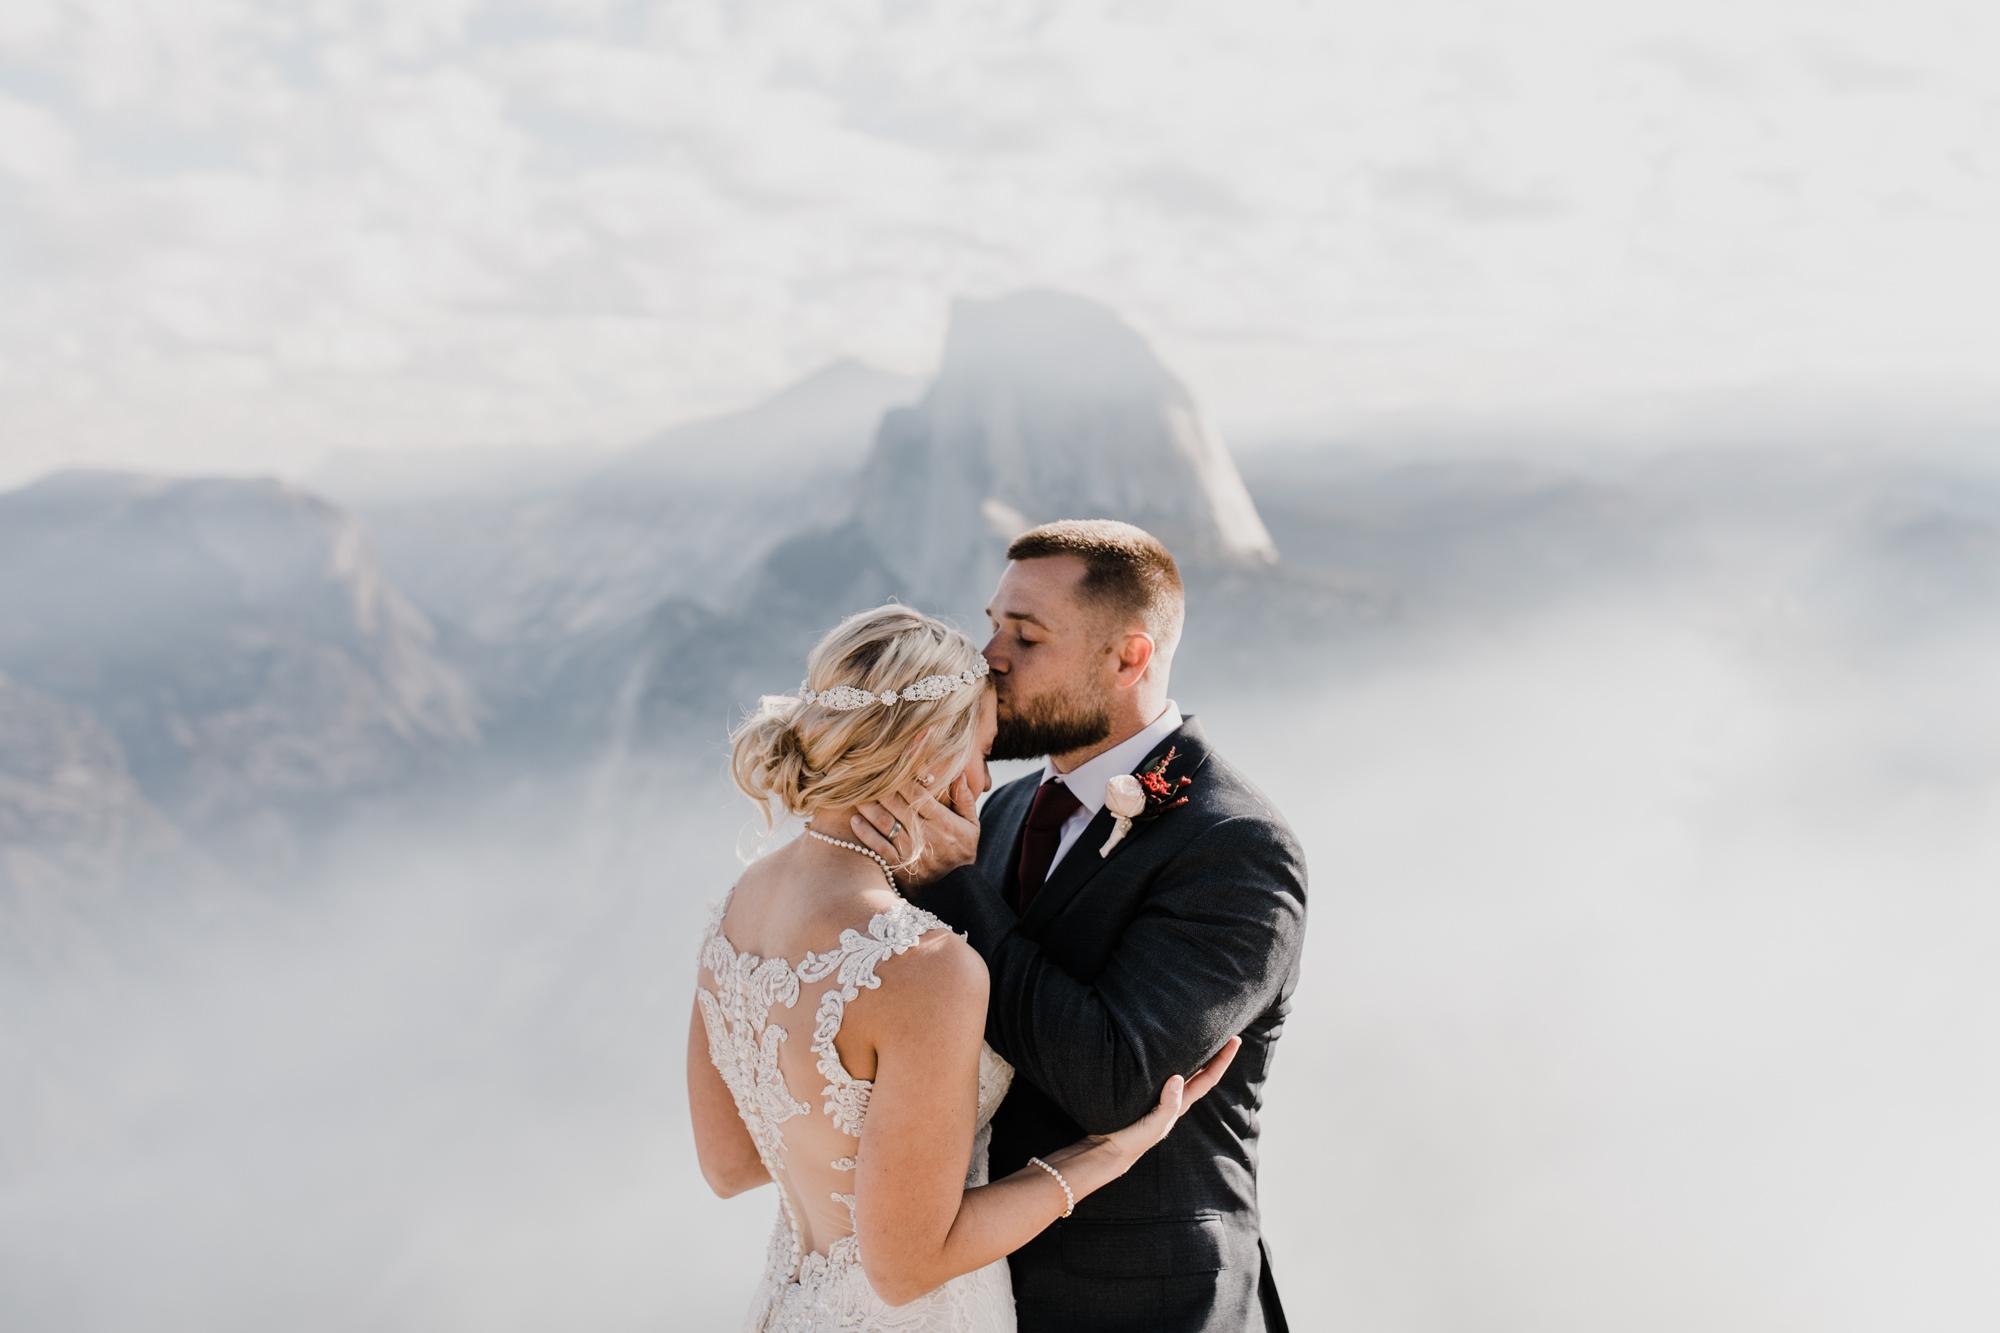 sunrise elopement in yosemite national park | destination adventure wedding photographers | the hearnes adventure photography | www.thehearnes.com